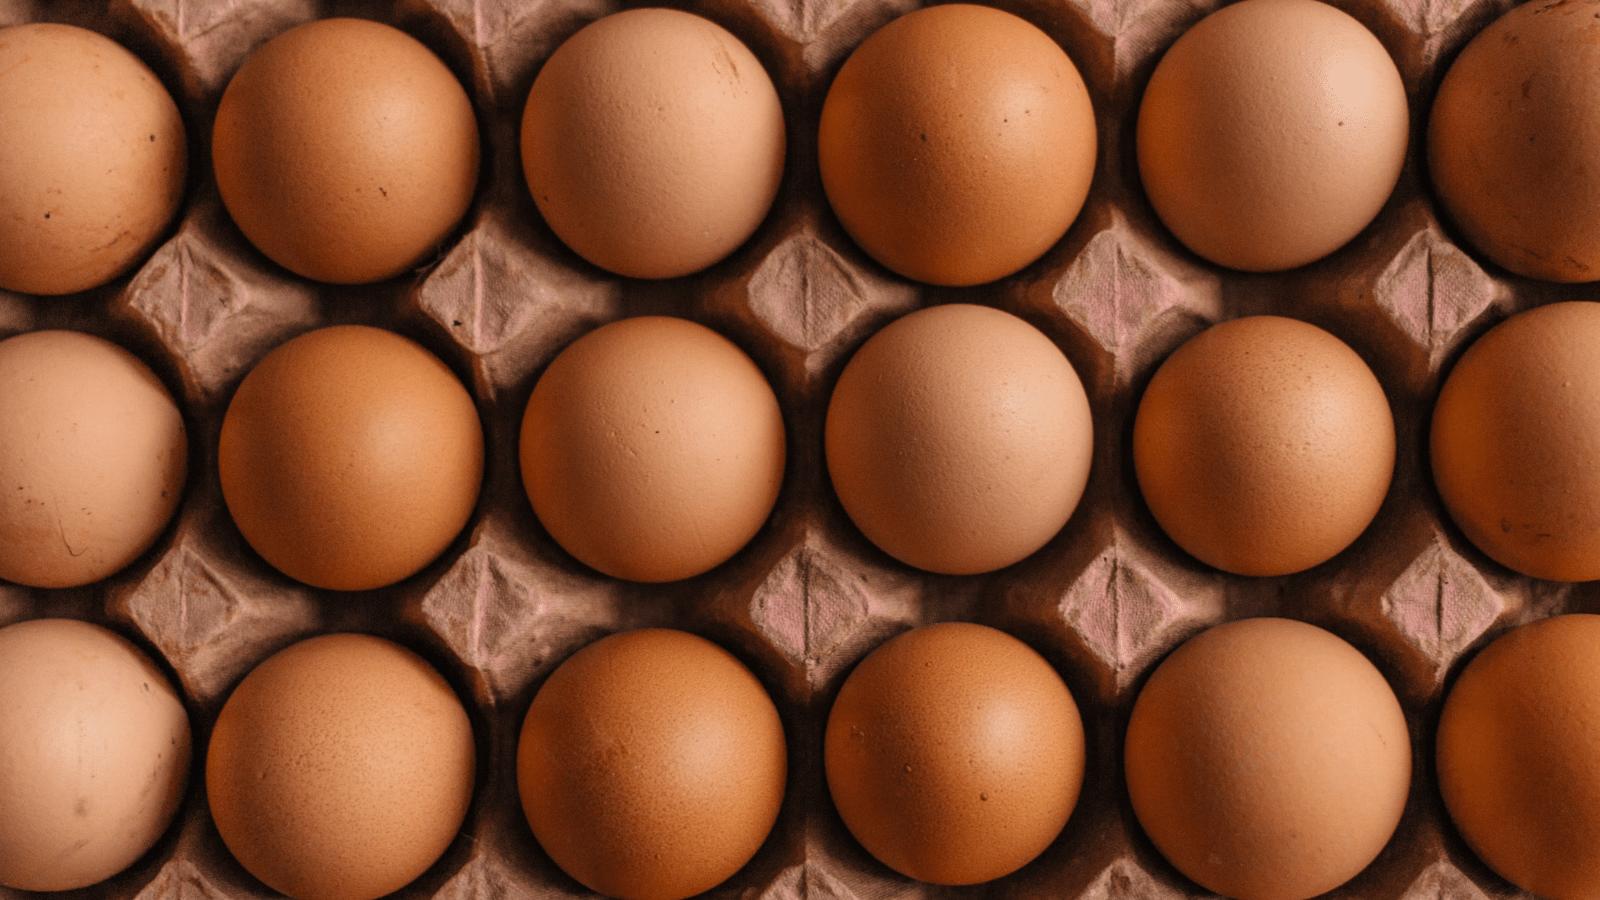 Dozens of brown eggs